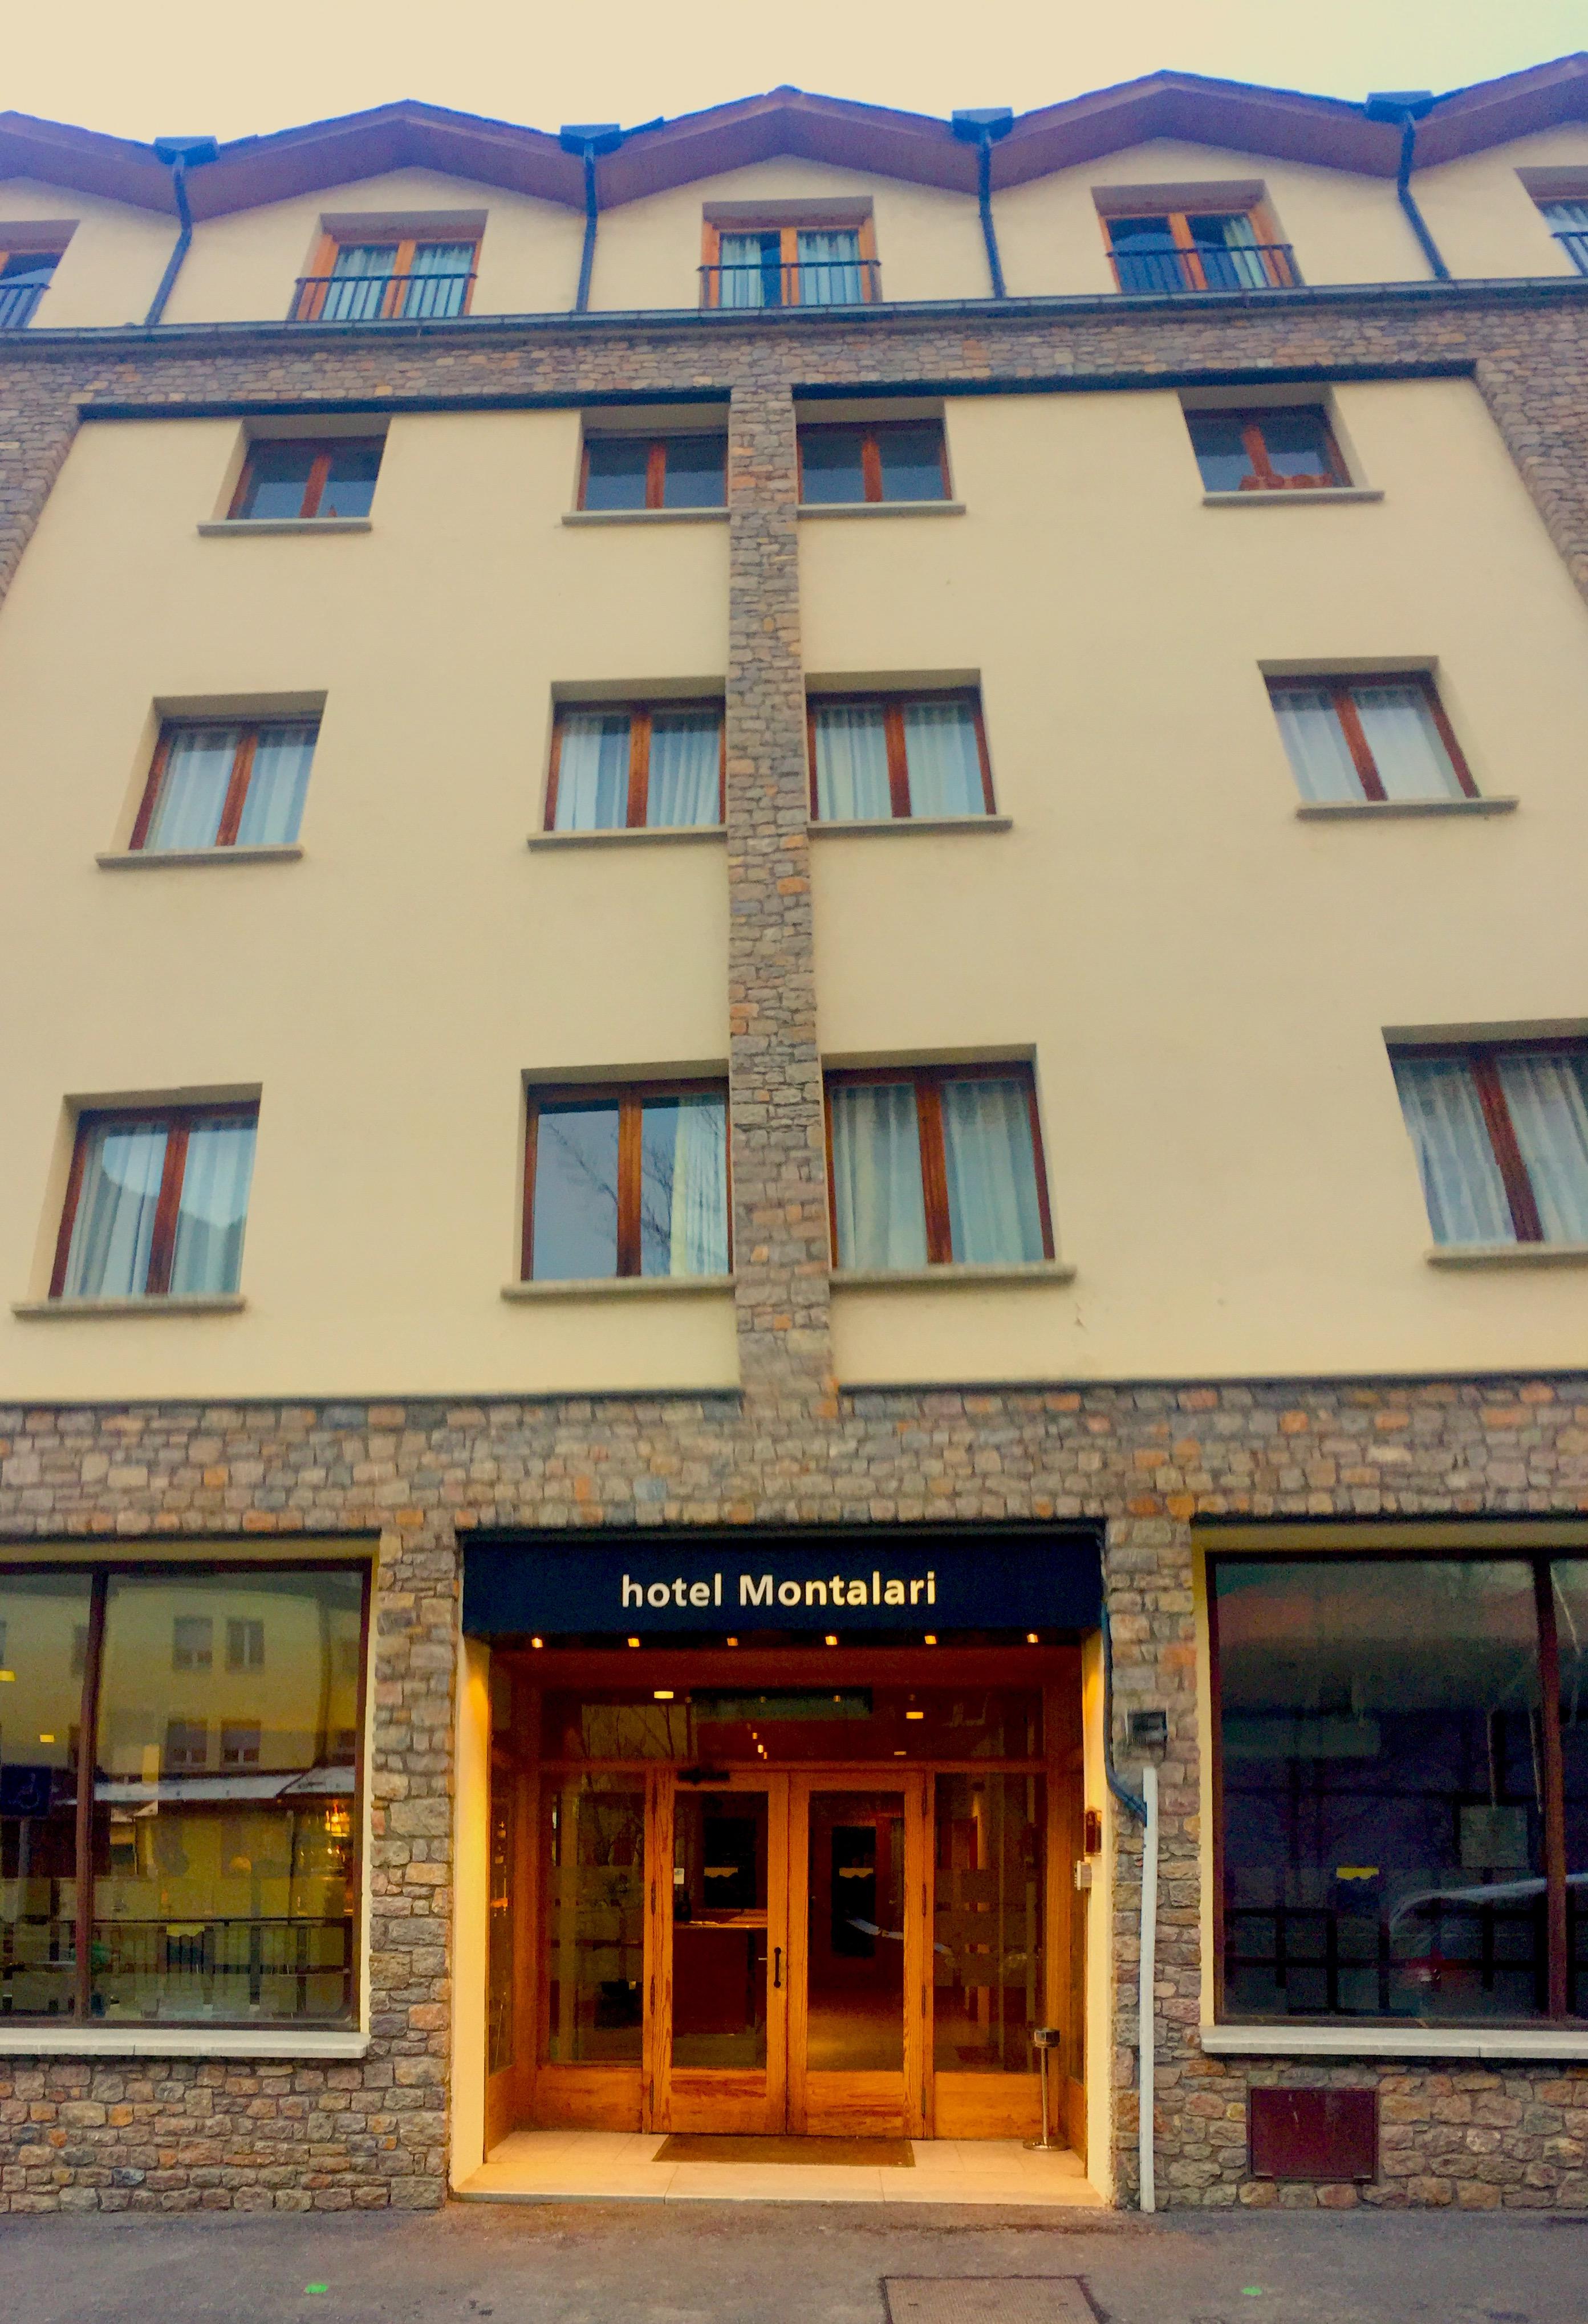 Hotel Holastays Hotel Montalari